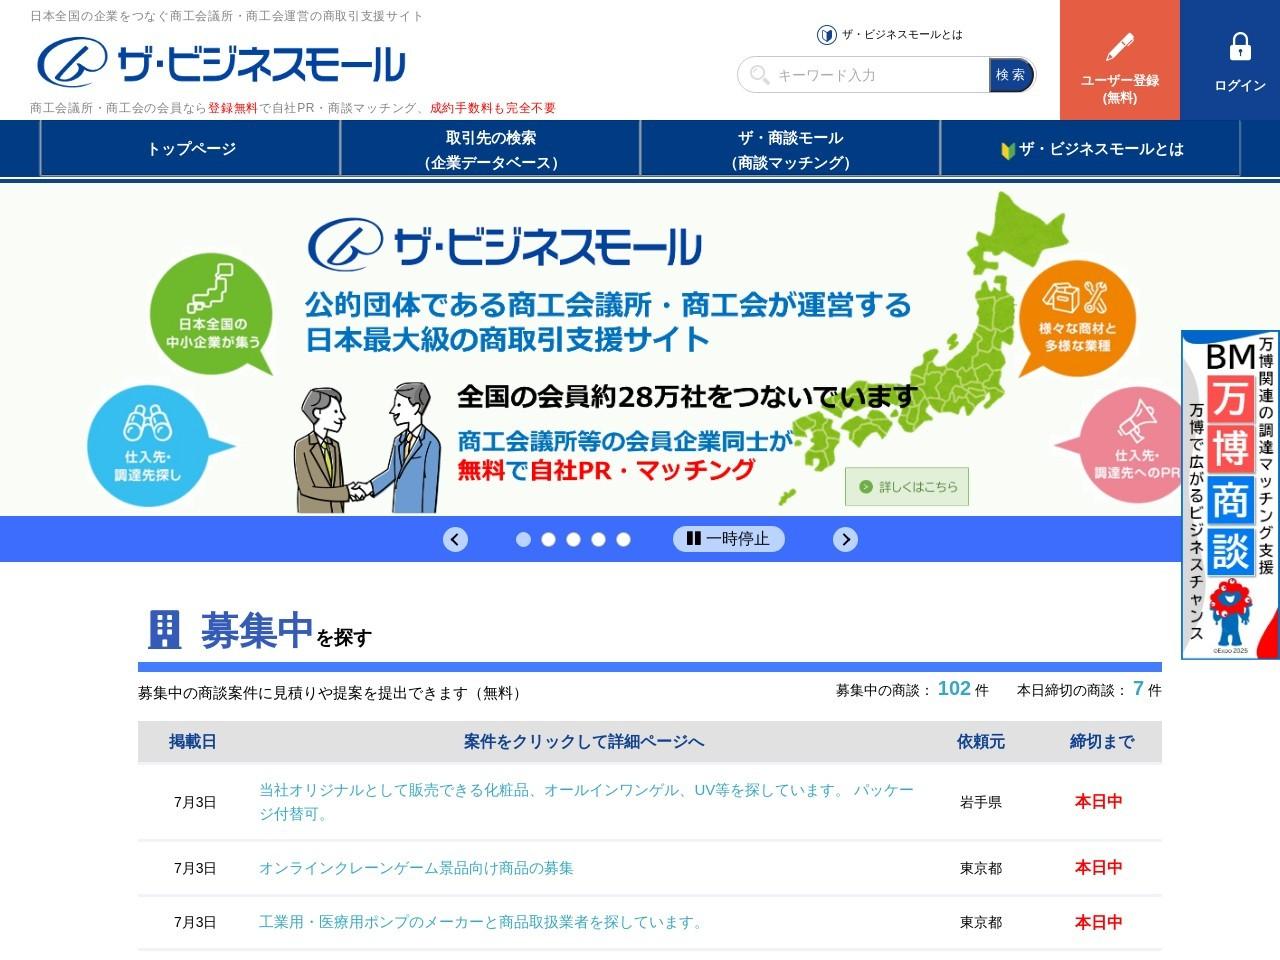 ザ・ビジネスモール - ザ・ビジネスモール | 商工会議所等の商談・商取引支援サイト -